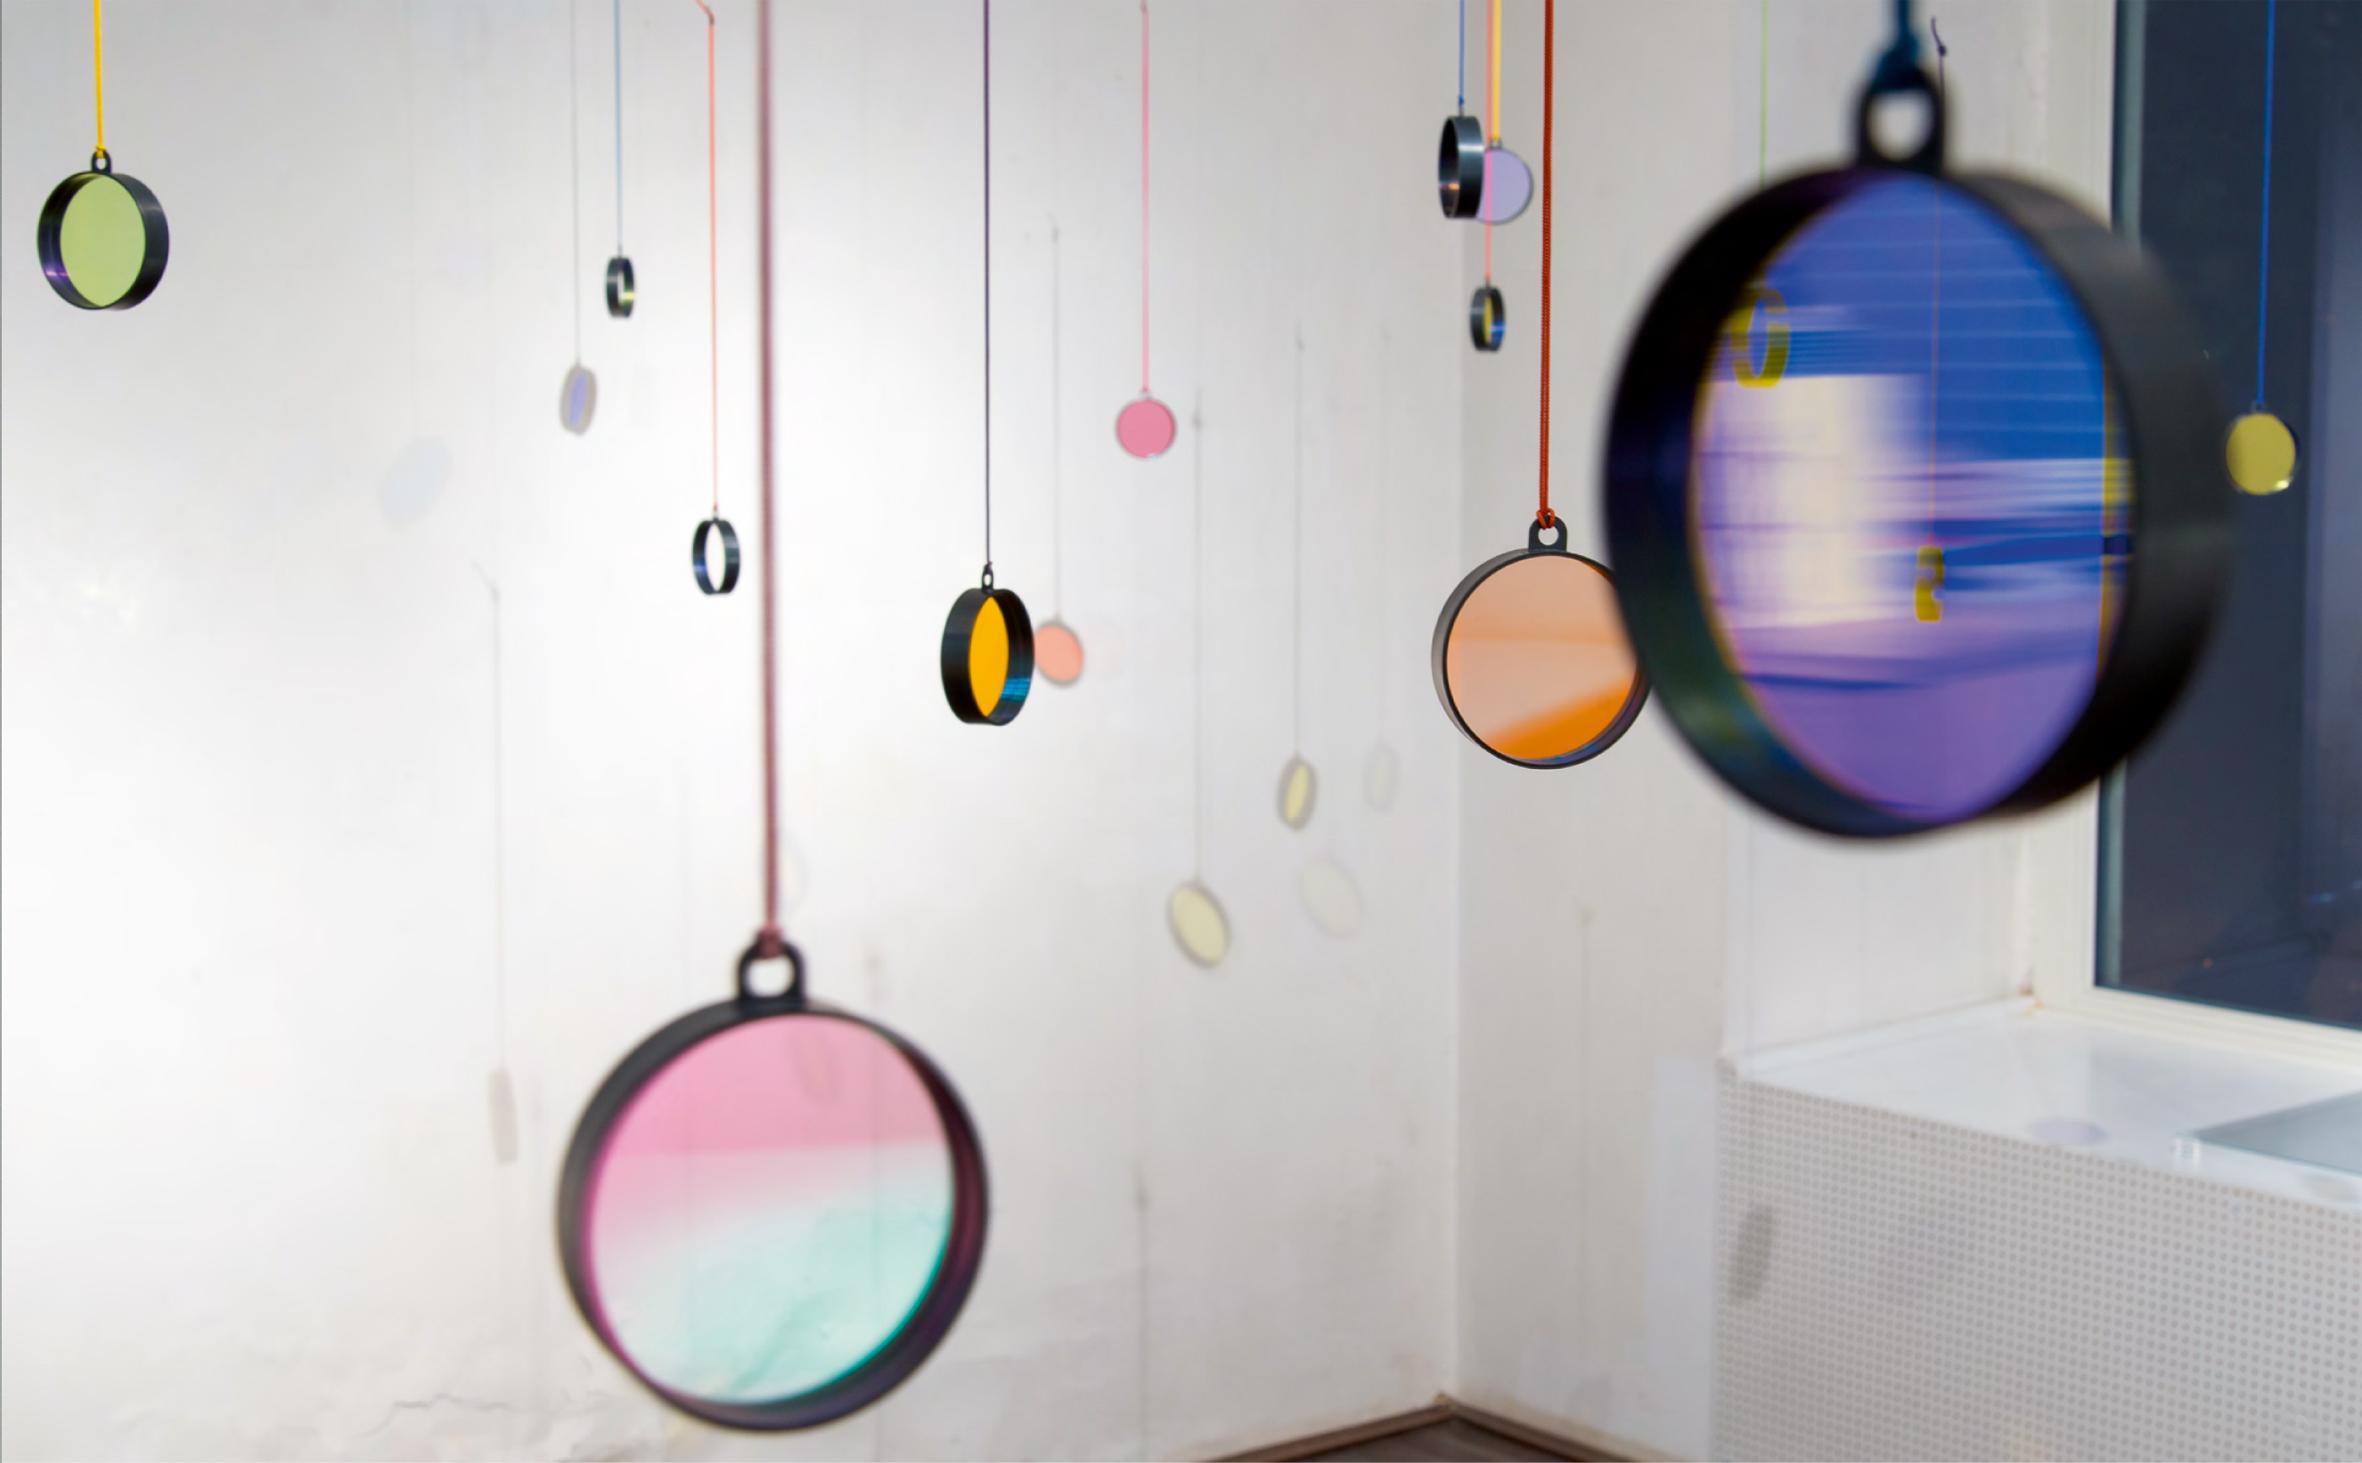 Jiro Kamata, Bi Pendant, halssieraden, 2013, OONA, cameralenzen, koord